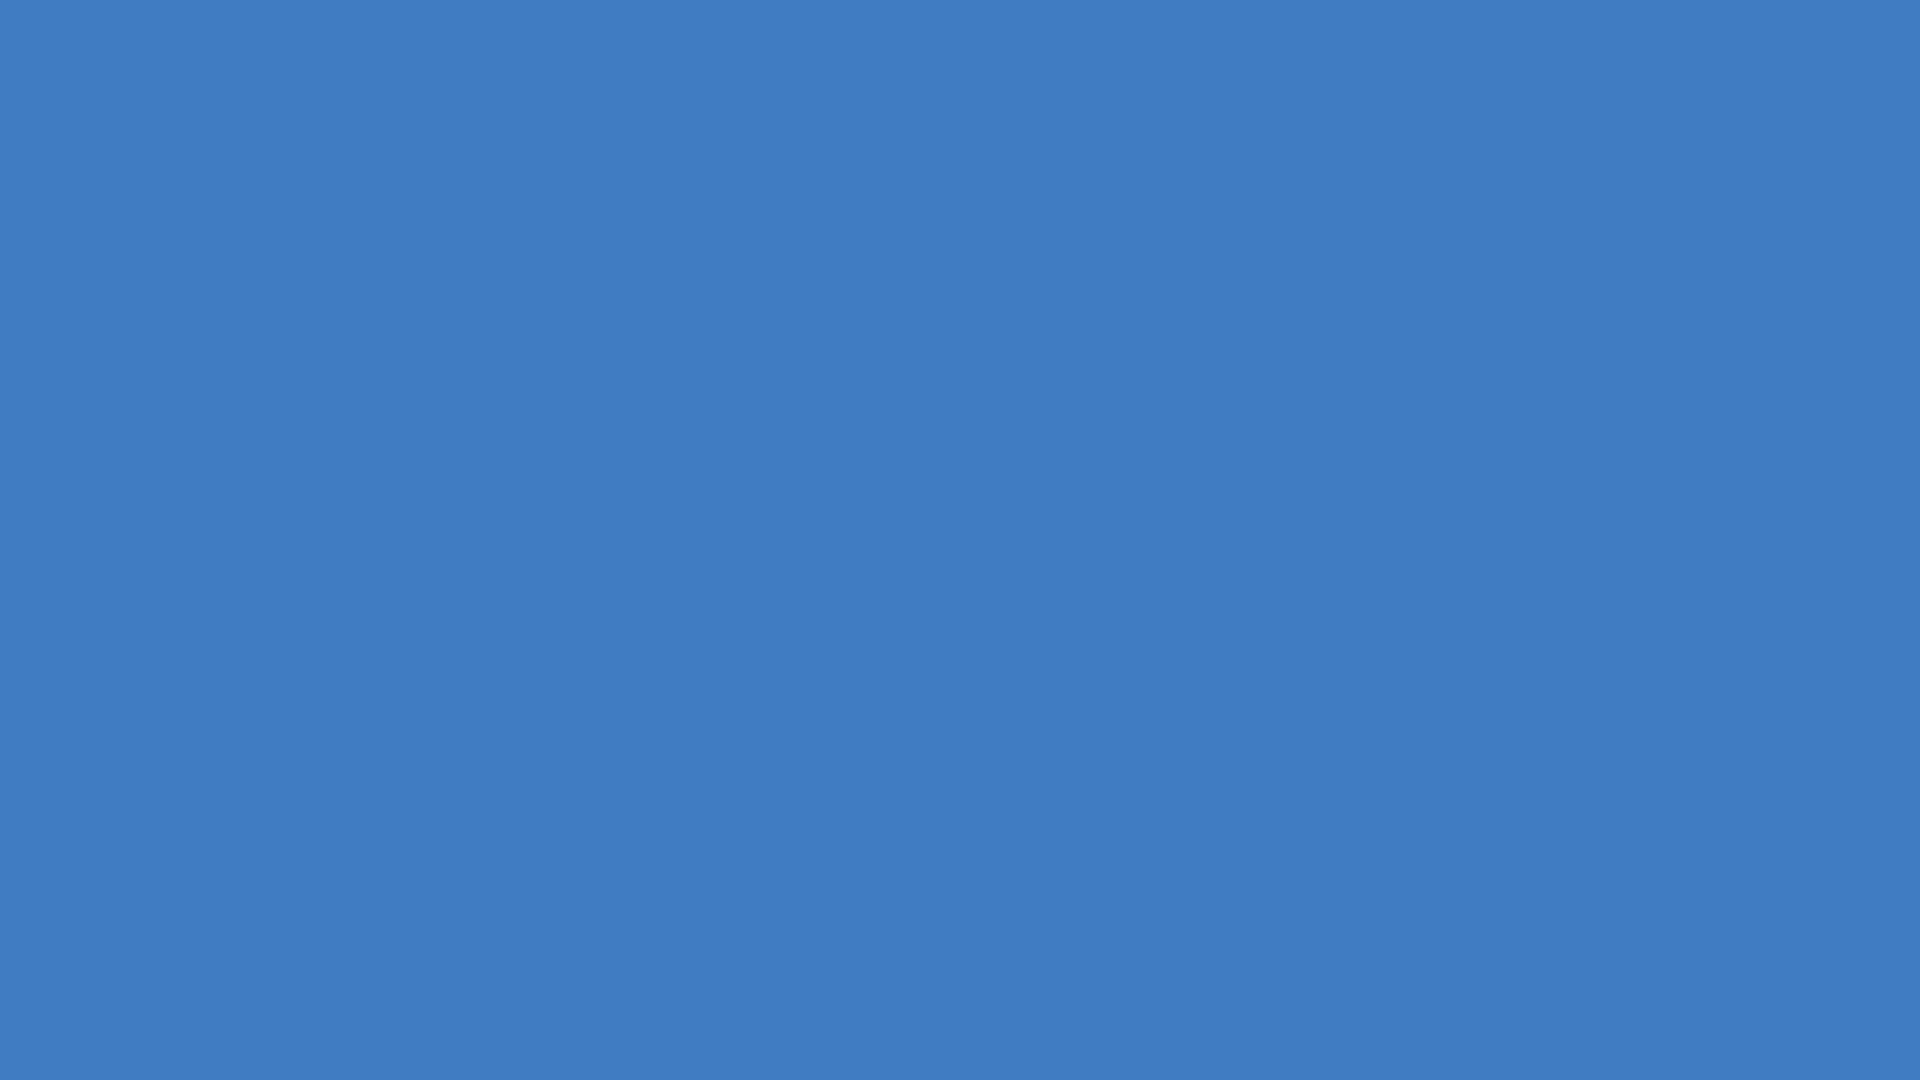 Solid Color Blue